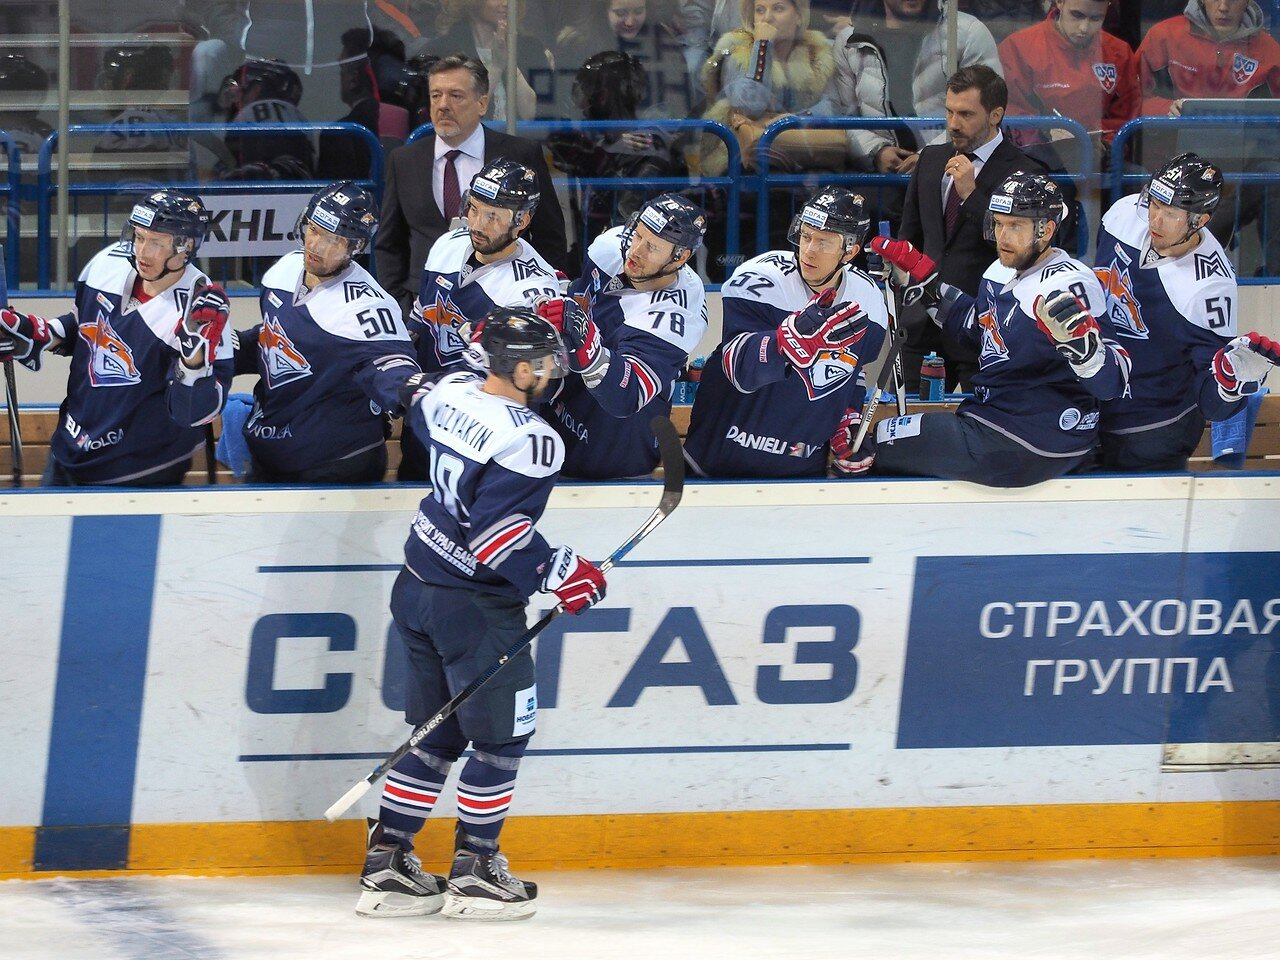 48Плей-офф 2016 Восток 1/2 Металлург - Сибирь 16.03.2016